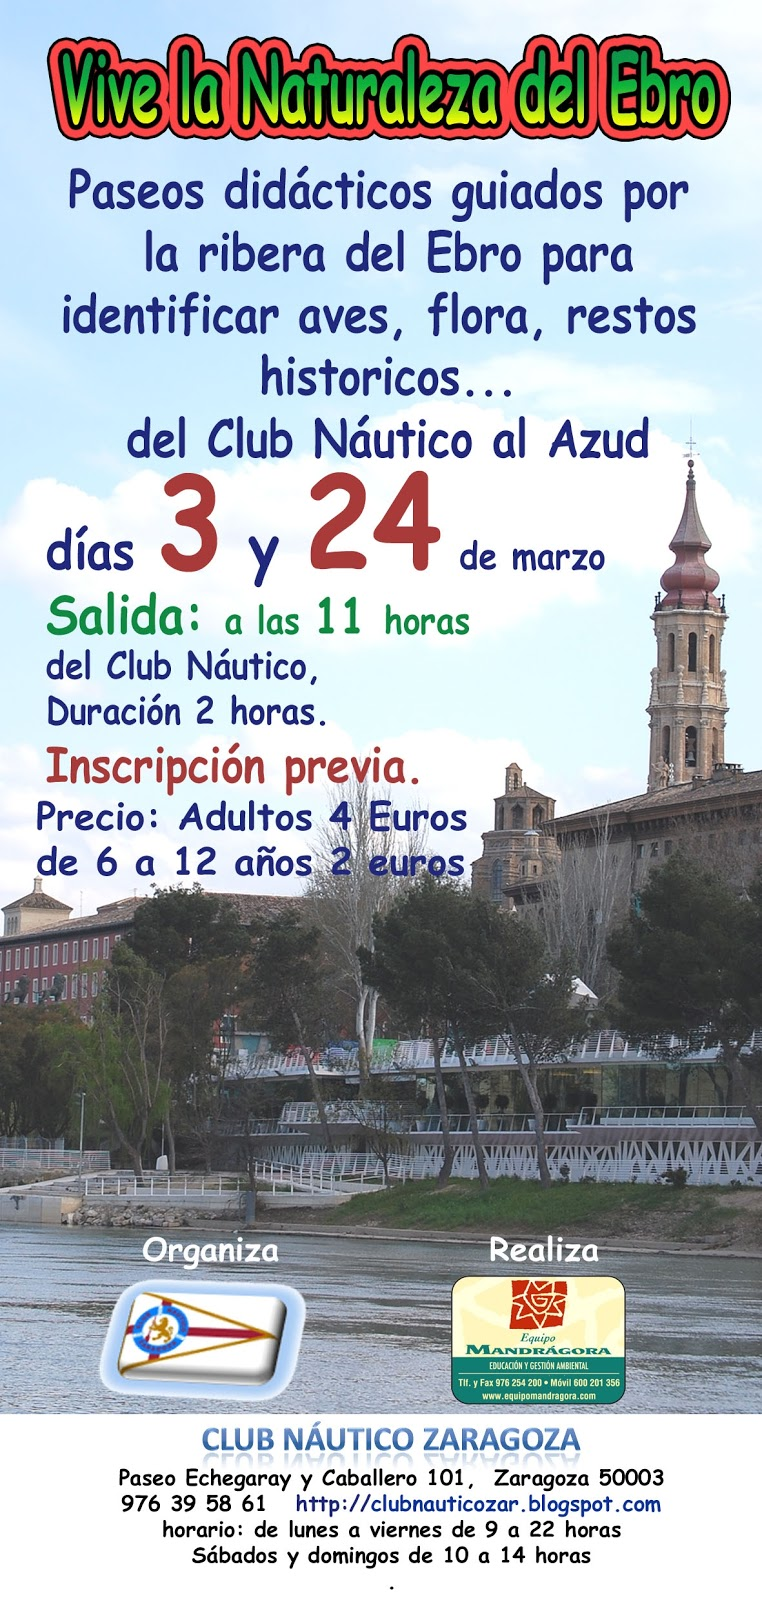 Club n utico zaragoza febrero 2013 - Club nautico zaragoza ...